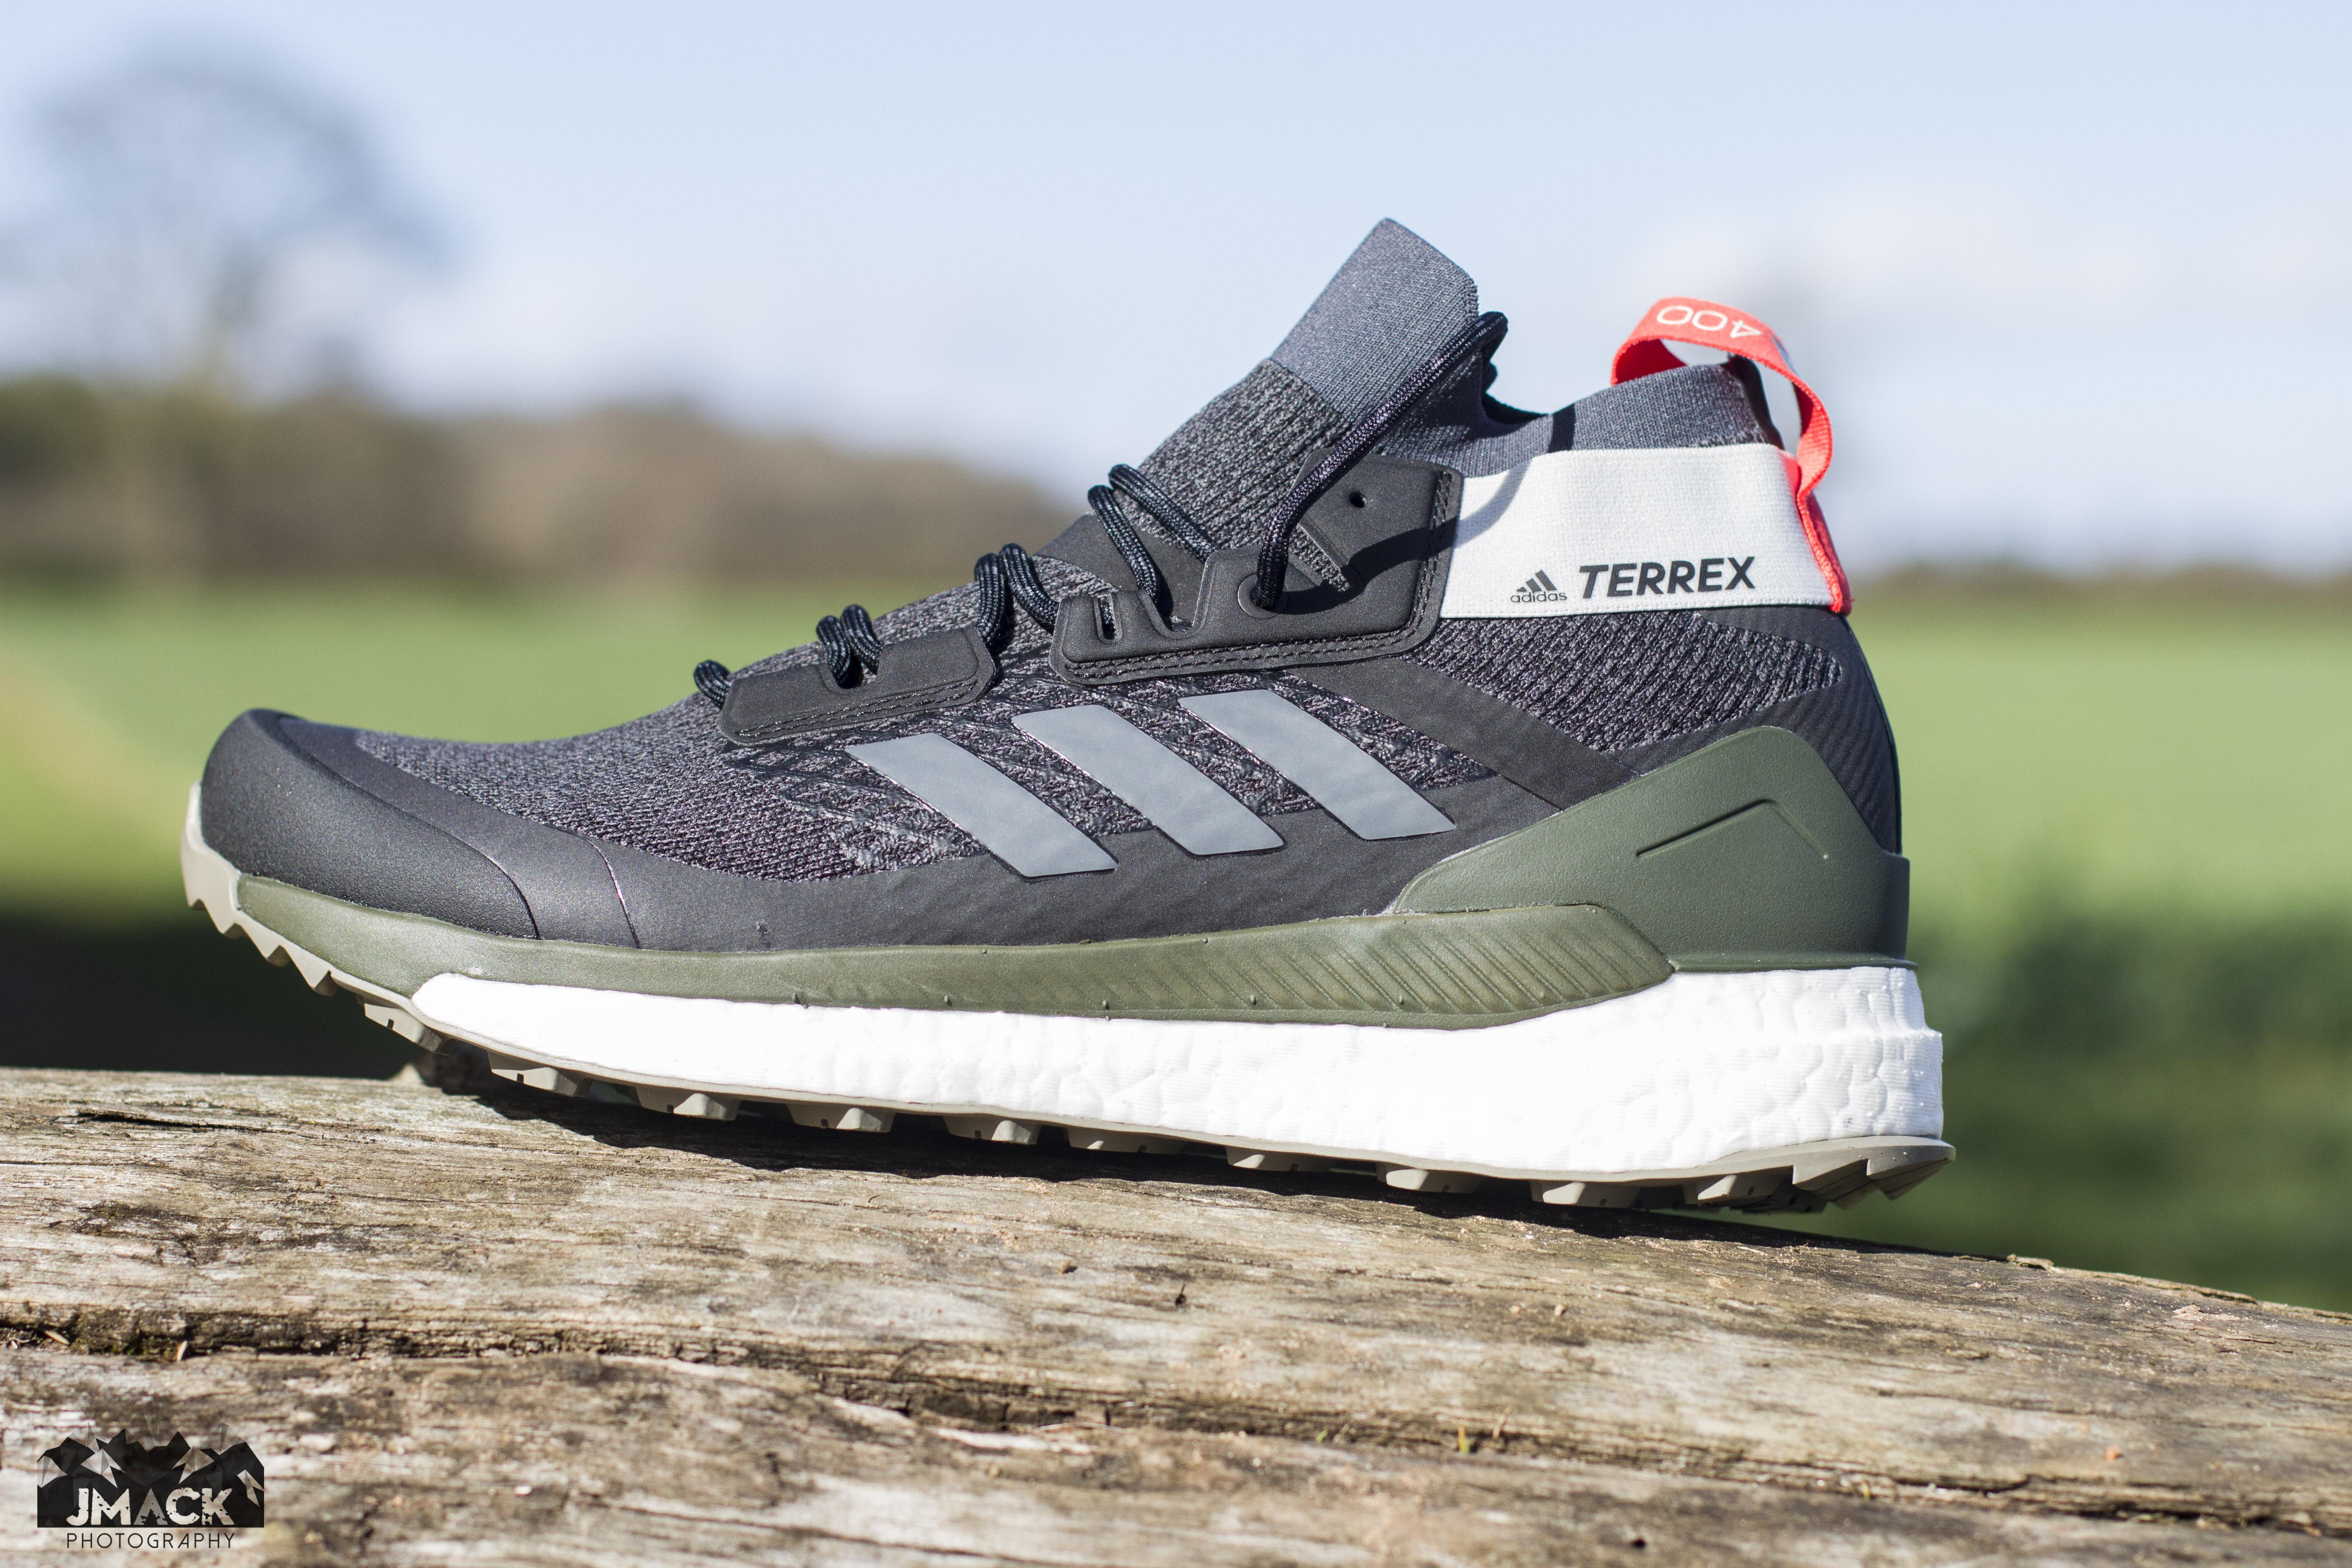 Adidas TERREX Free Hiker – James Mackeddie